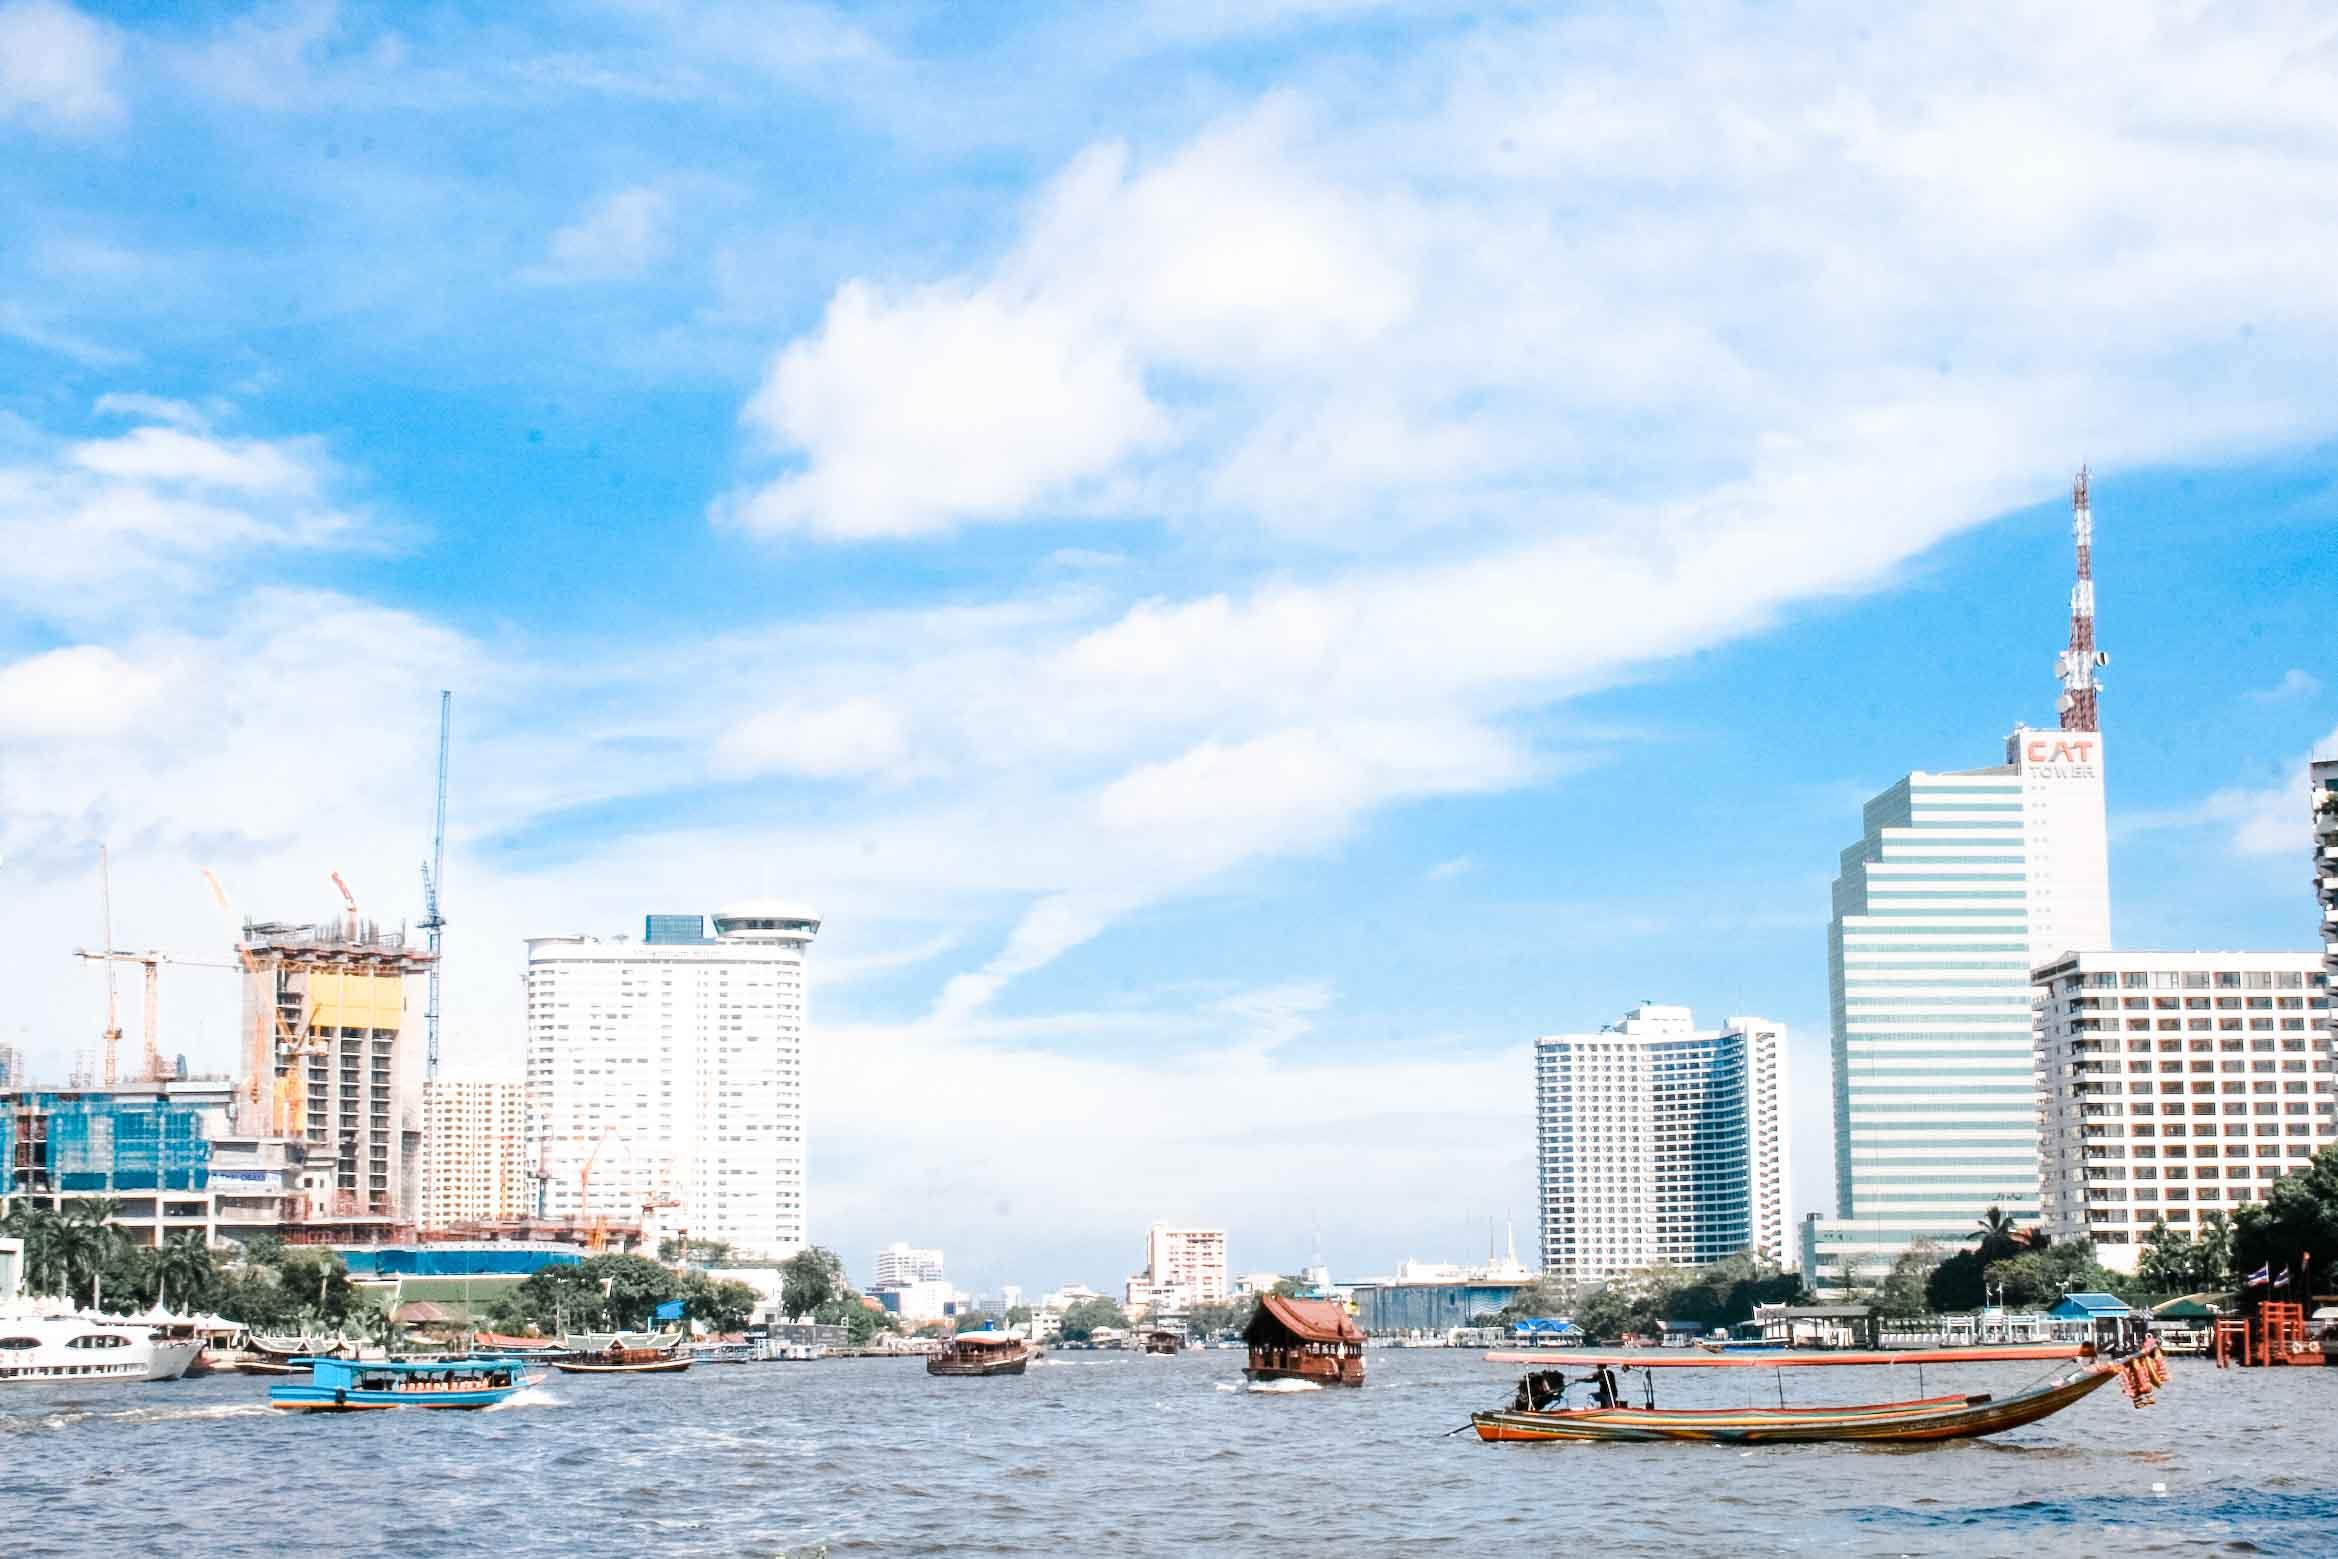 Bangkok Lebua Tower Hotel